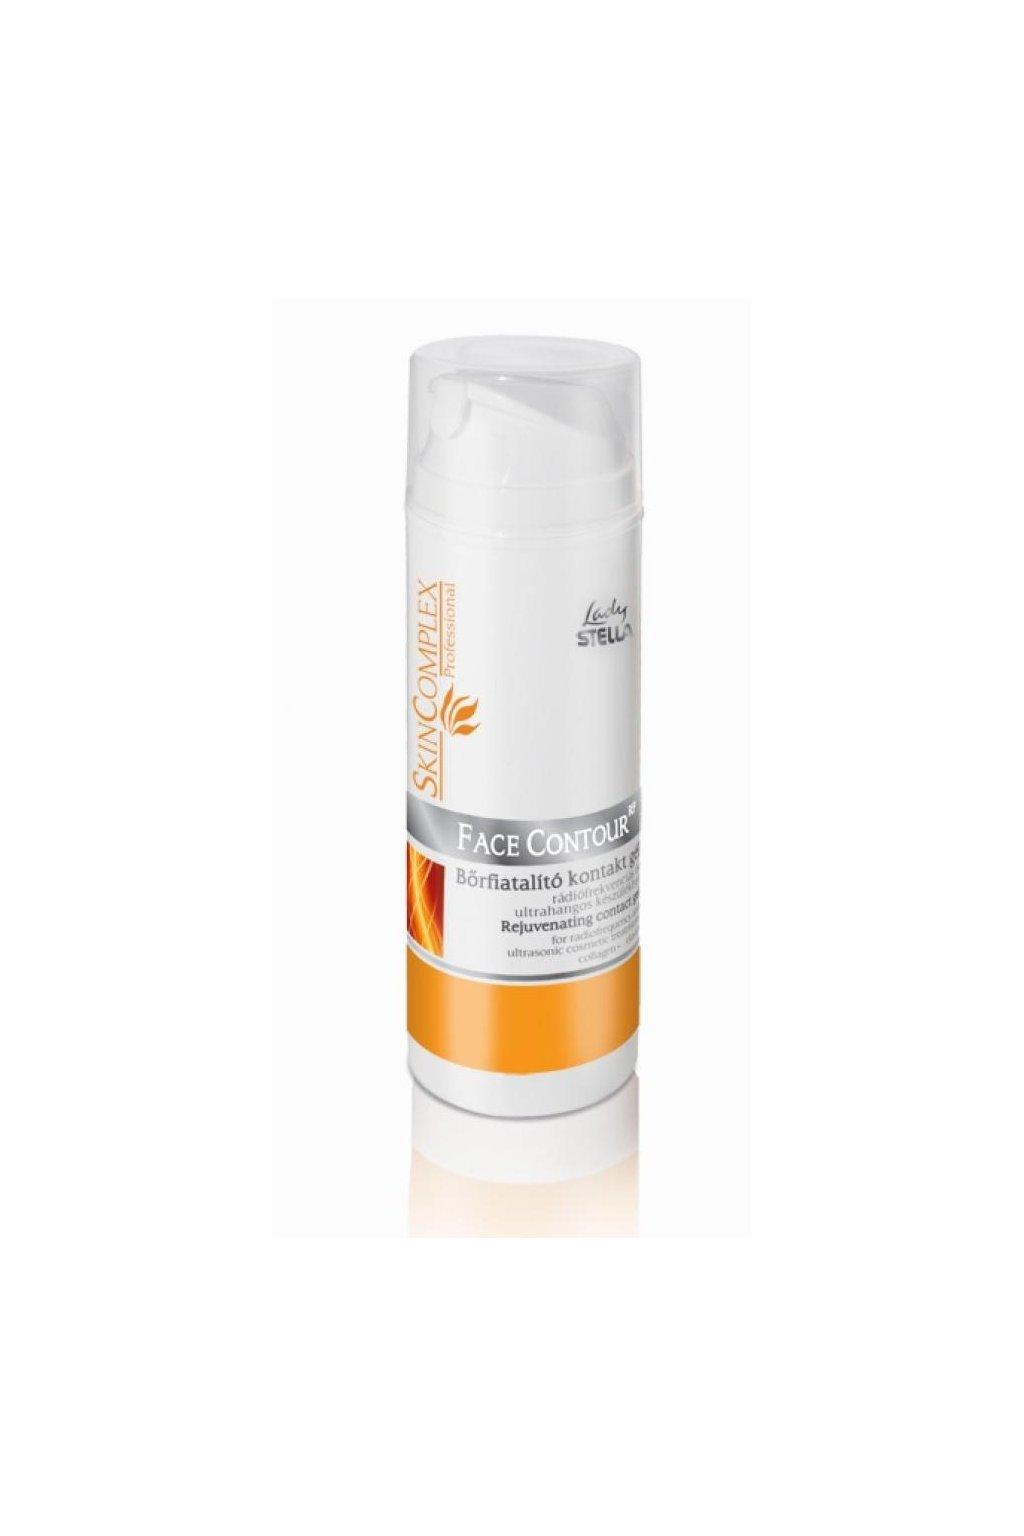 SKINCOMPLEX FACE CONTOUR ultrazvukový dermální gel s elastinem a kolagenem